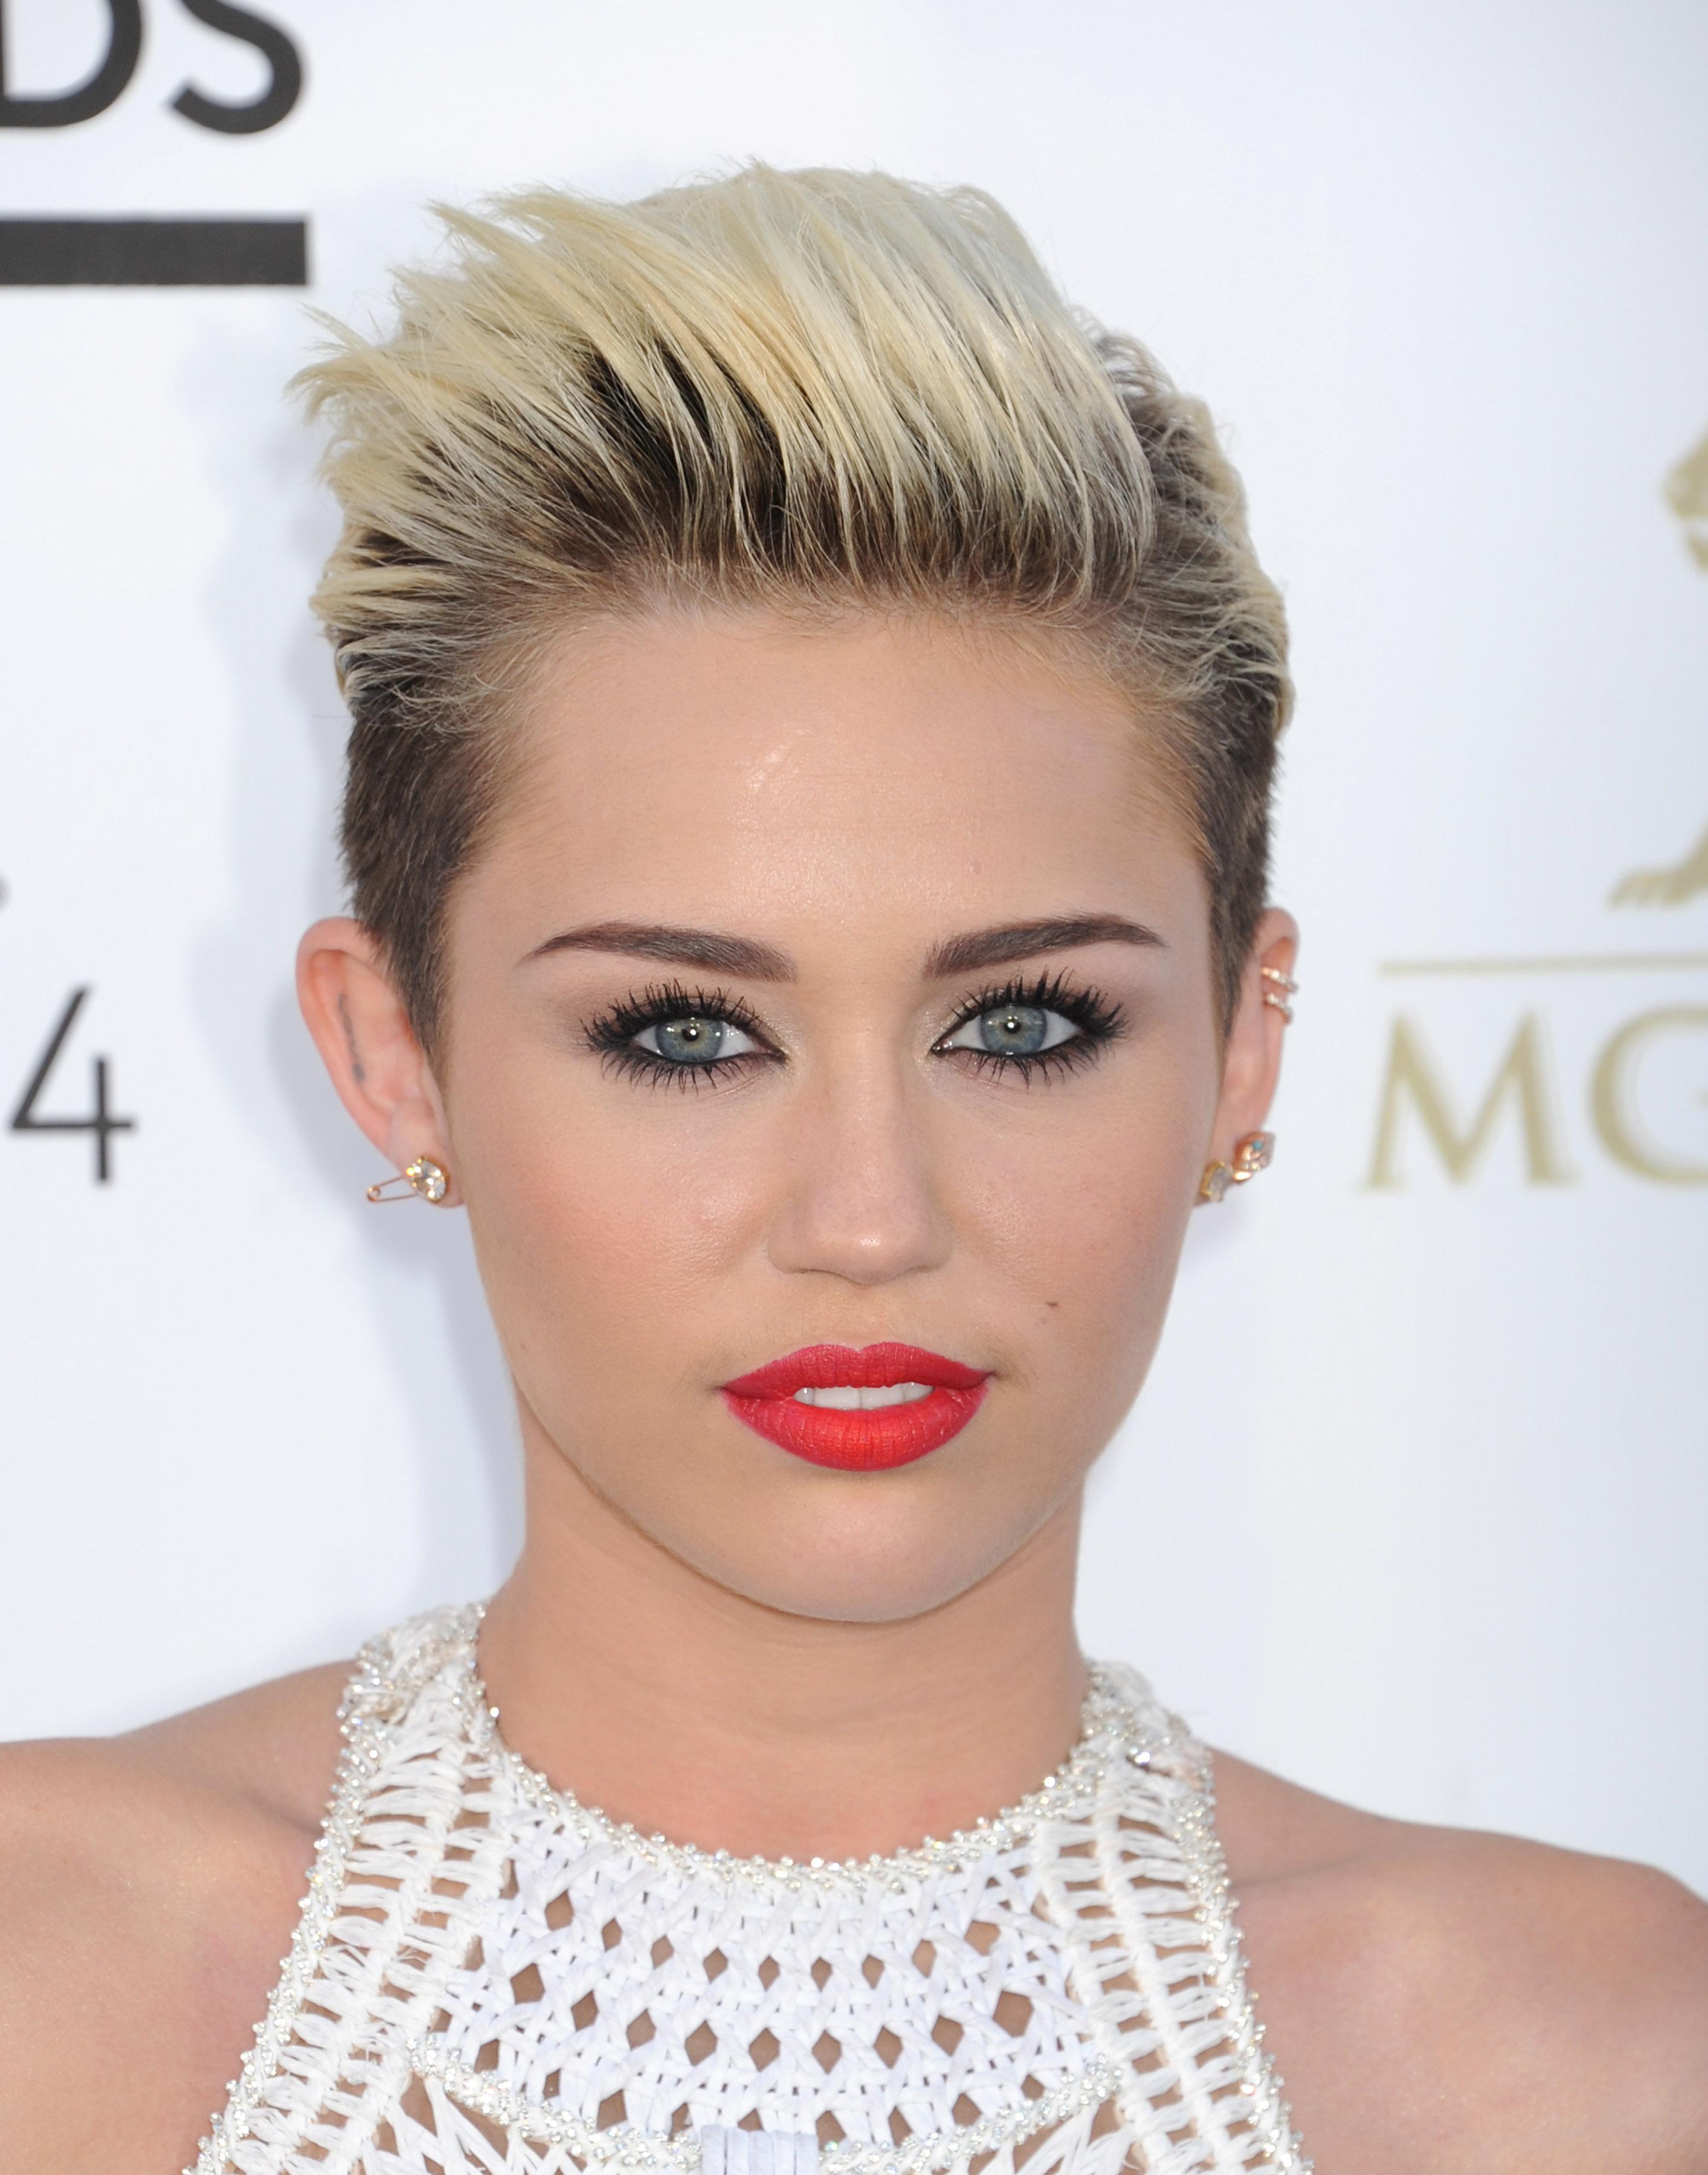 Miley-Cyrus-short-hair